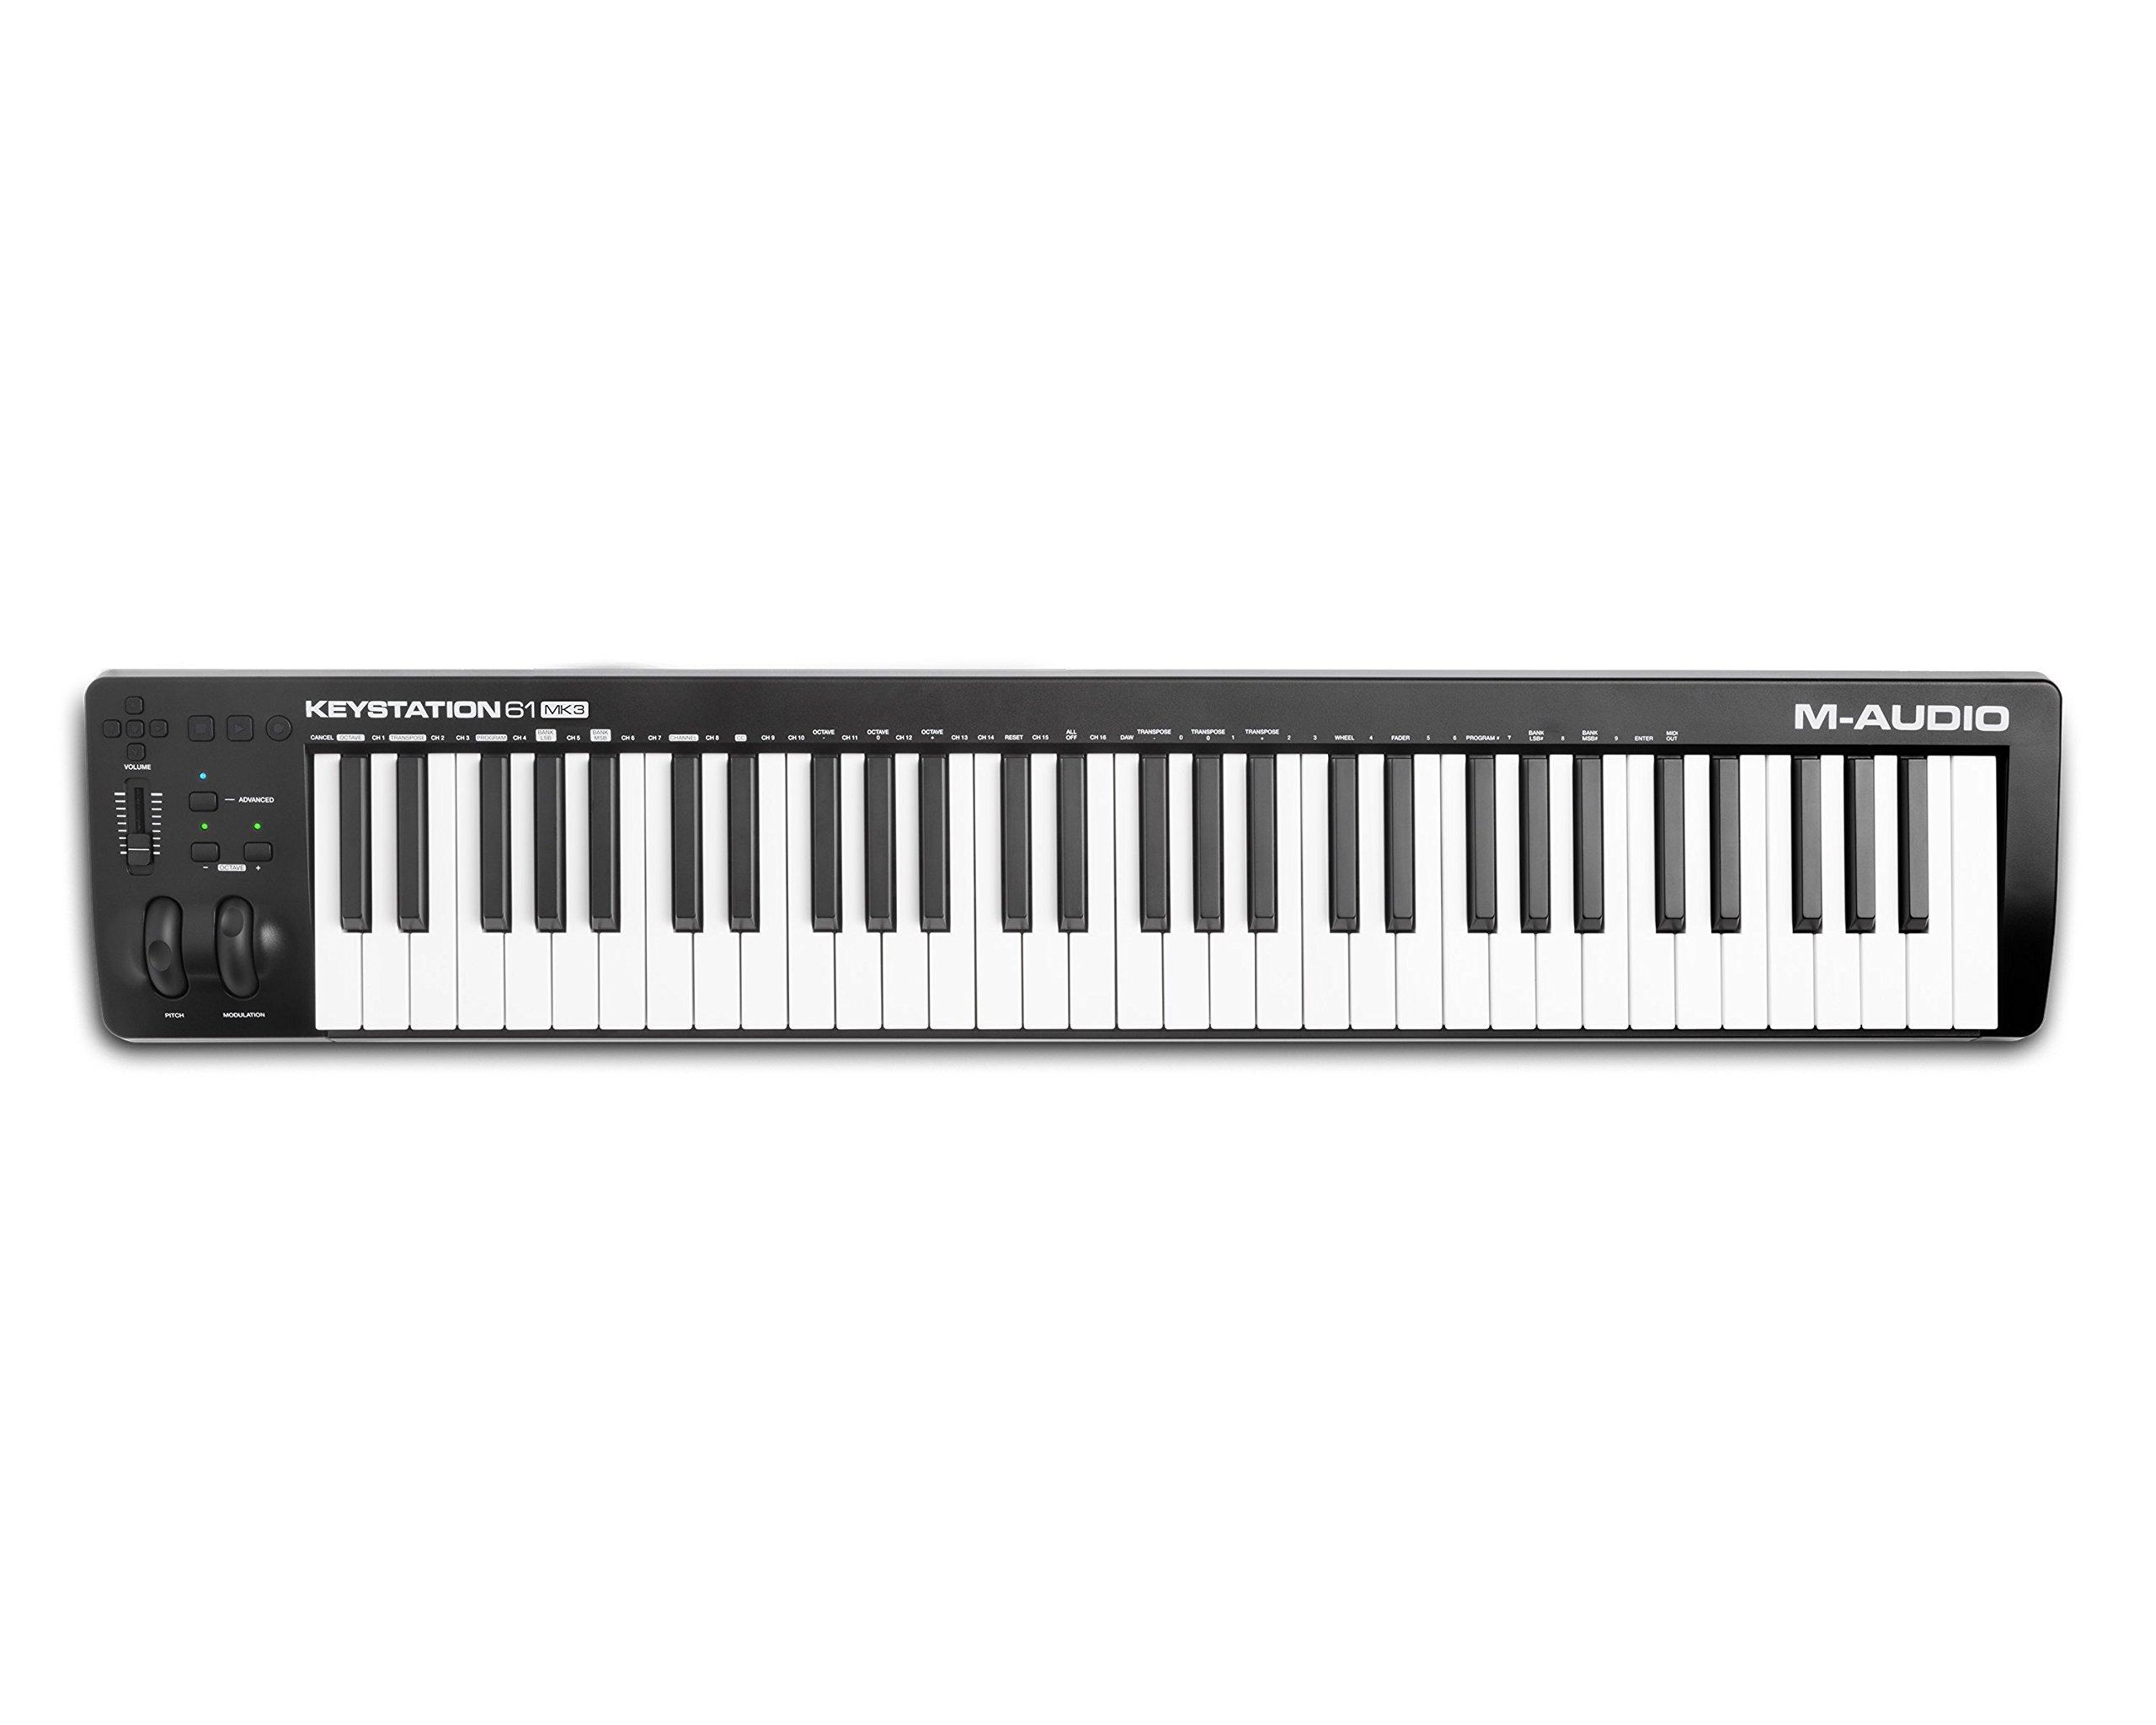 M-Audio Keystation 61MK3 | Compact Semi-Weighted 61-Key USB-Powered MIDI Keyboard Controller by M-Audio (Image #6)